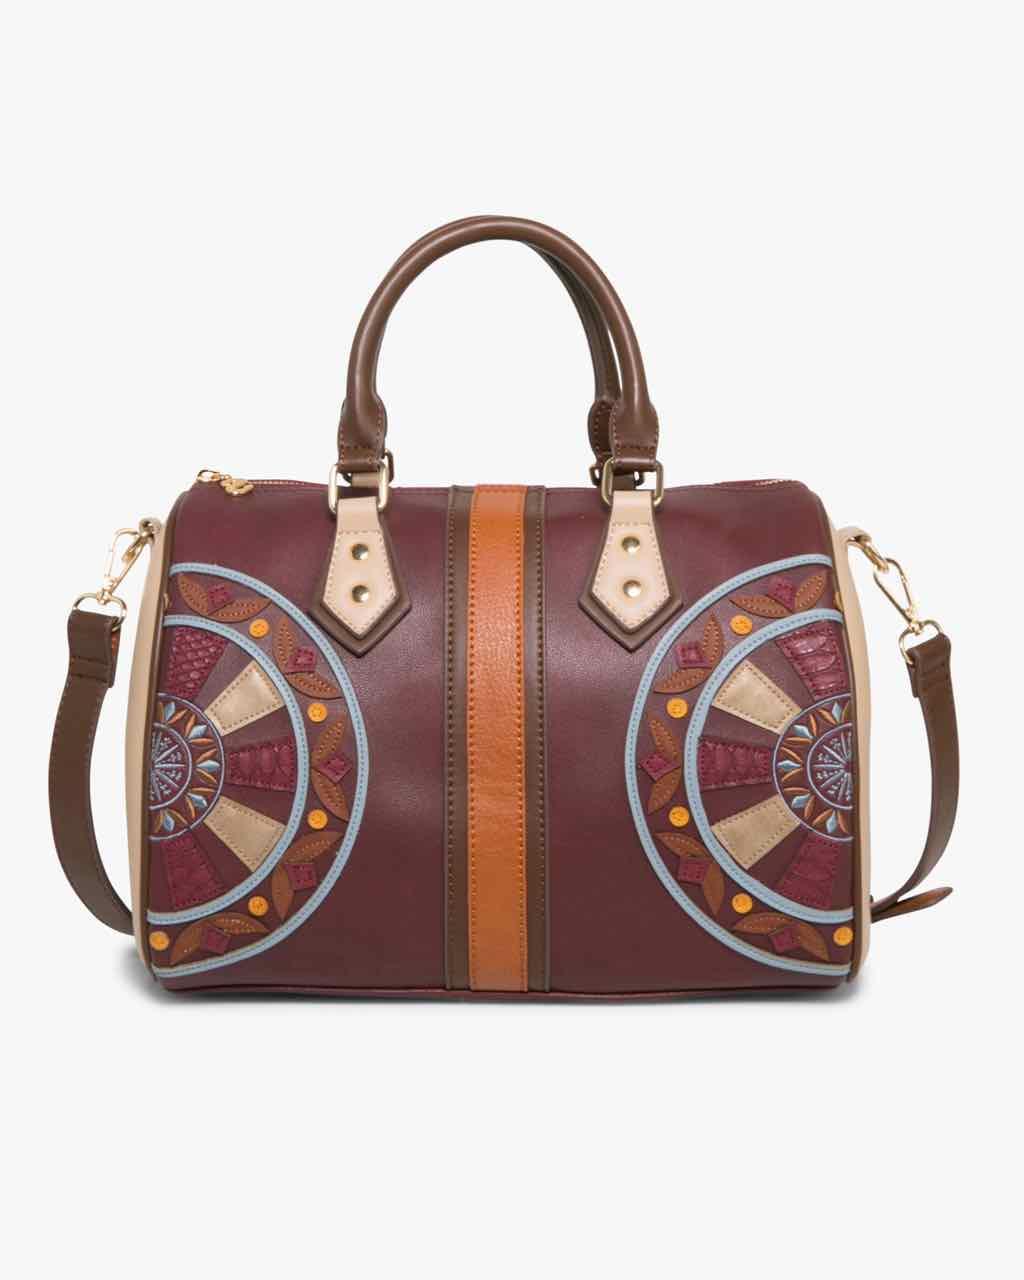 17WAXPKD_3006 Desigual Bag Bowling Celia Buy Online